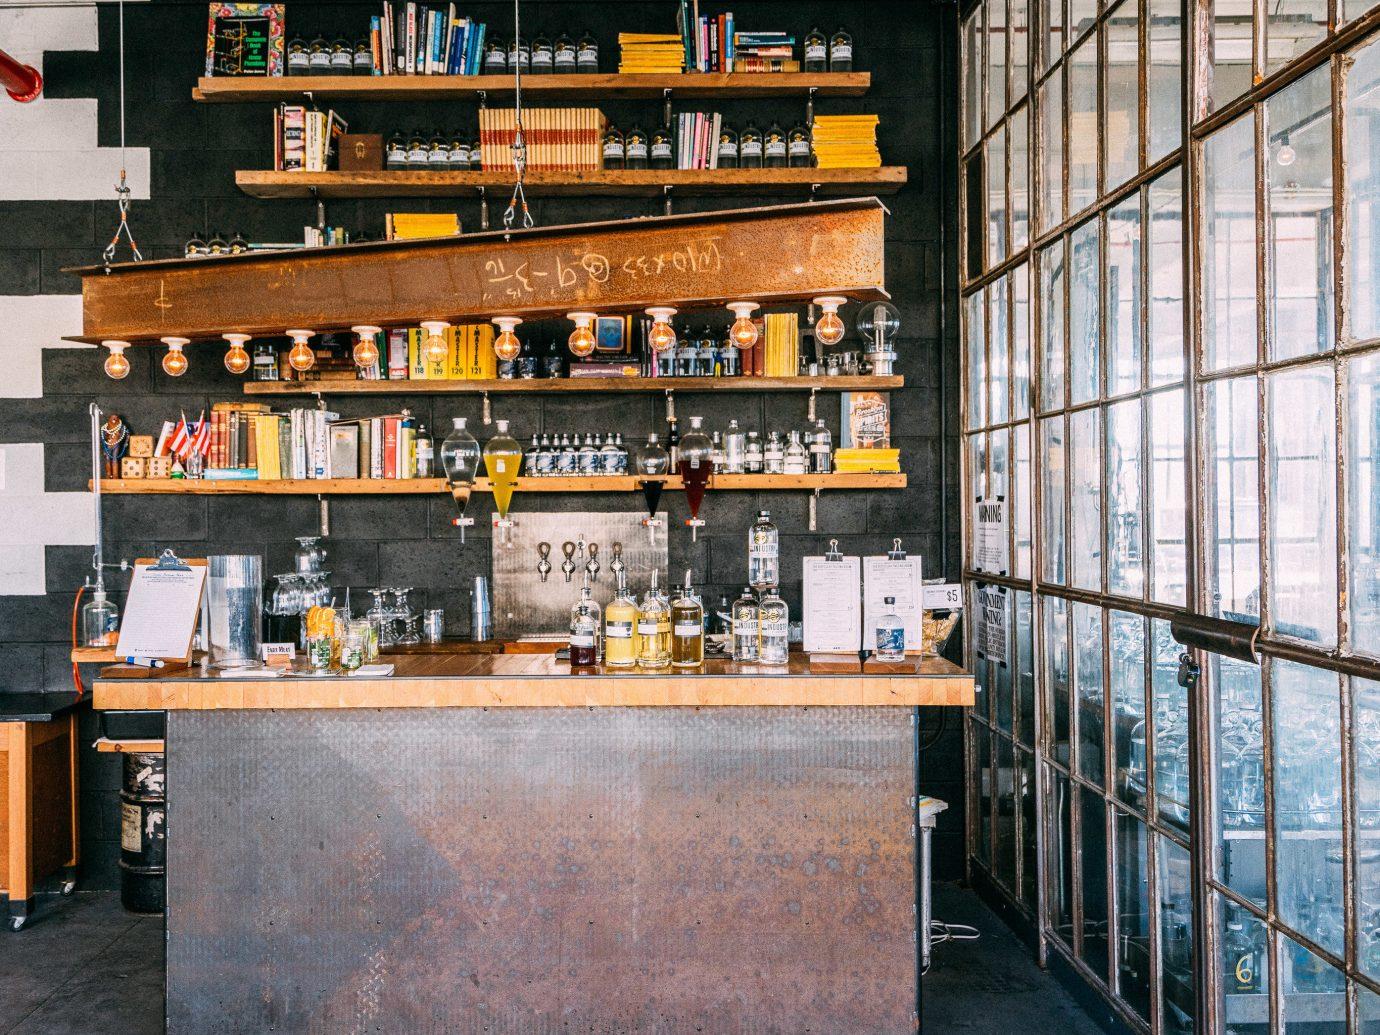 Brooklyn Food + Drink furniture interior design restaurant liquor store